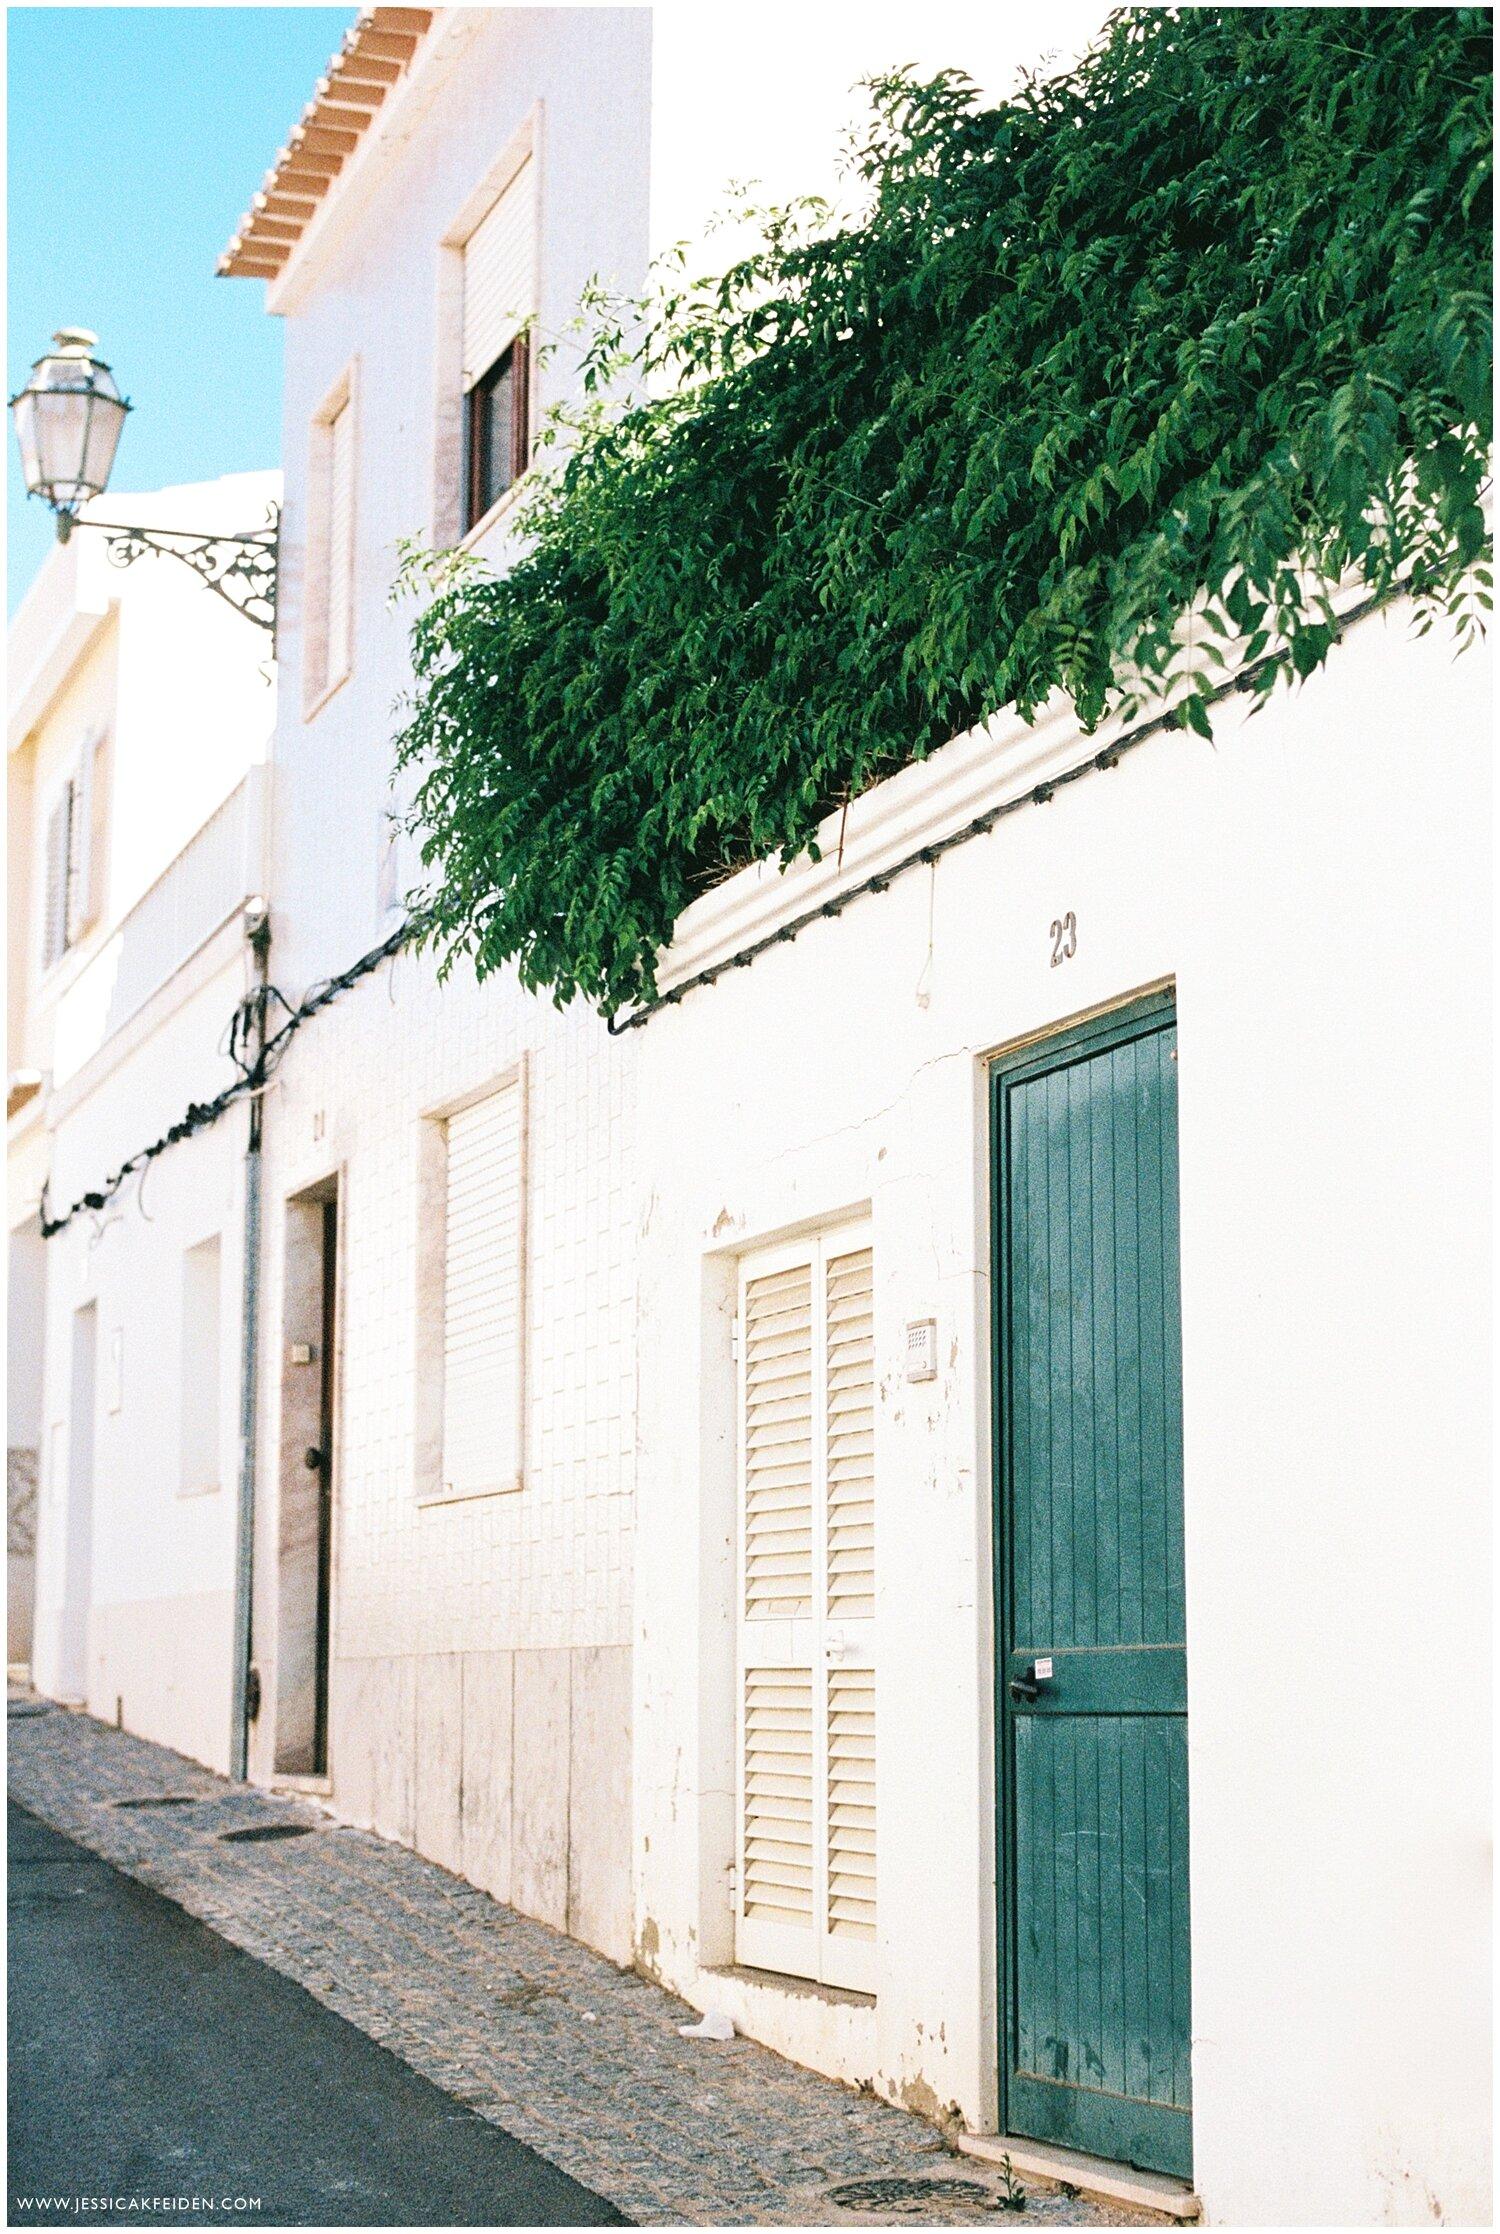 Jessica K Feiden Photography_Portugal Film Photographer_Portugal Travel Photographs.jpg